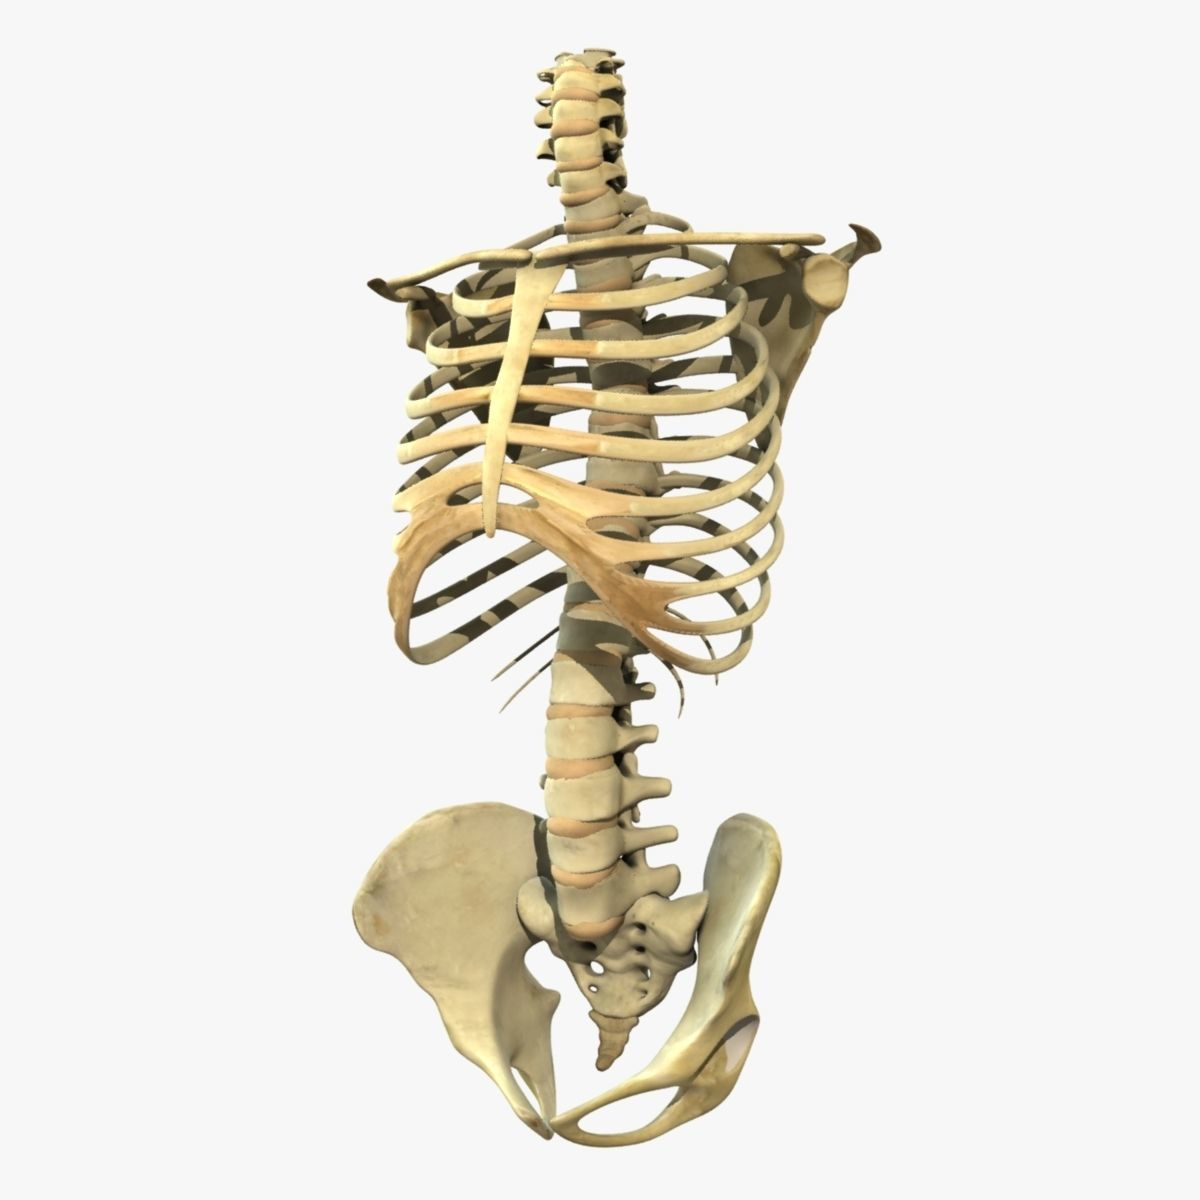 Skeleton Torso Anatomy 3d Cgtrader